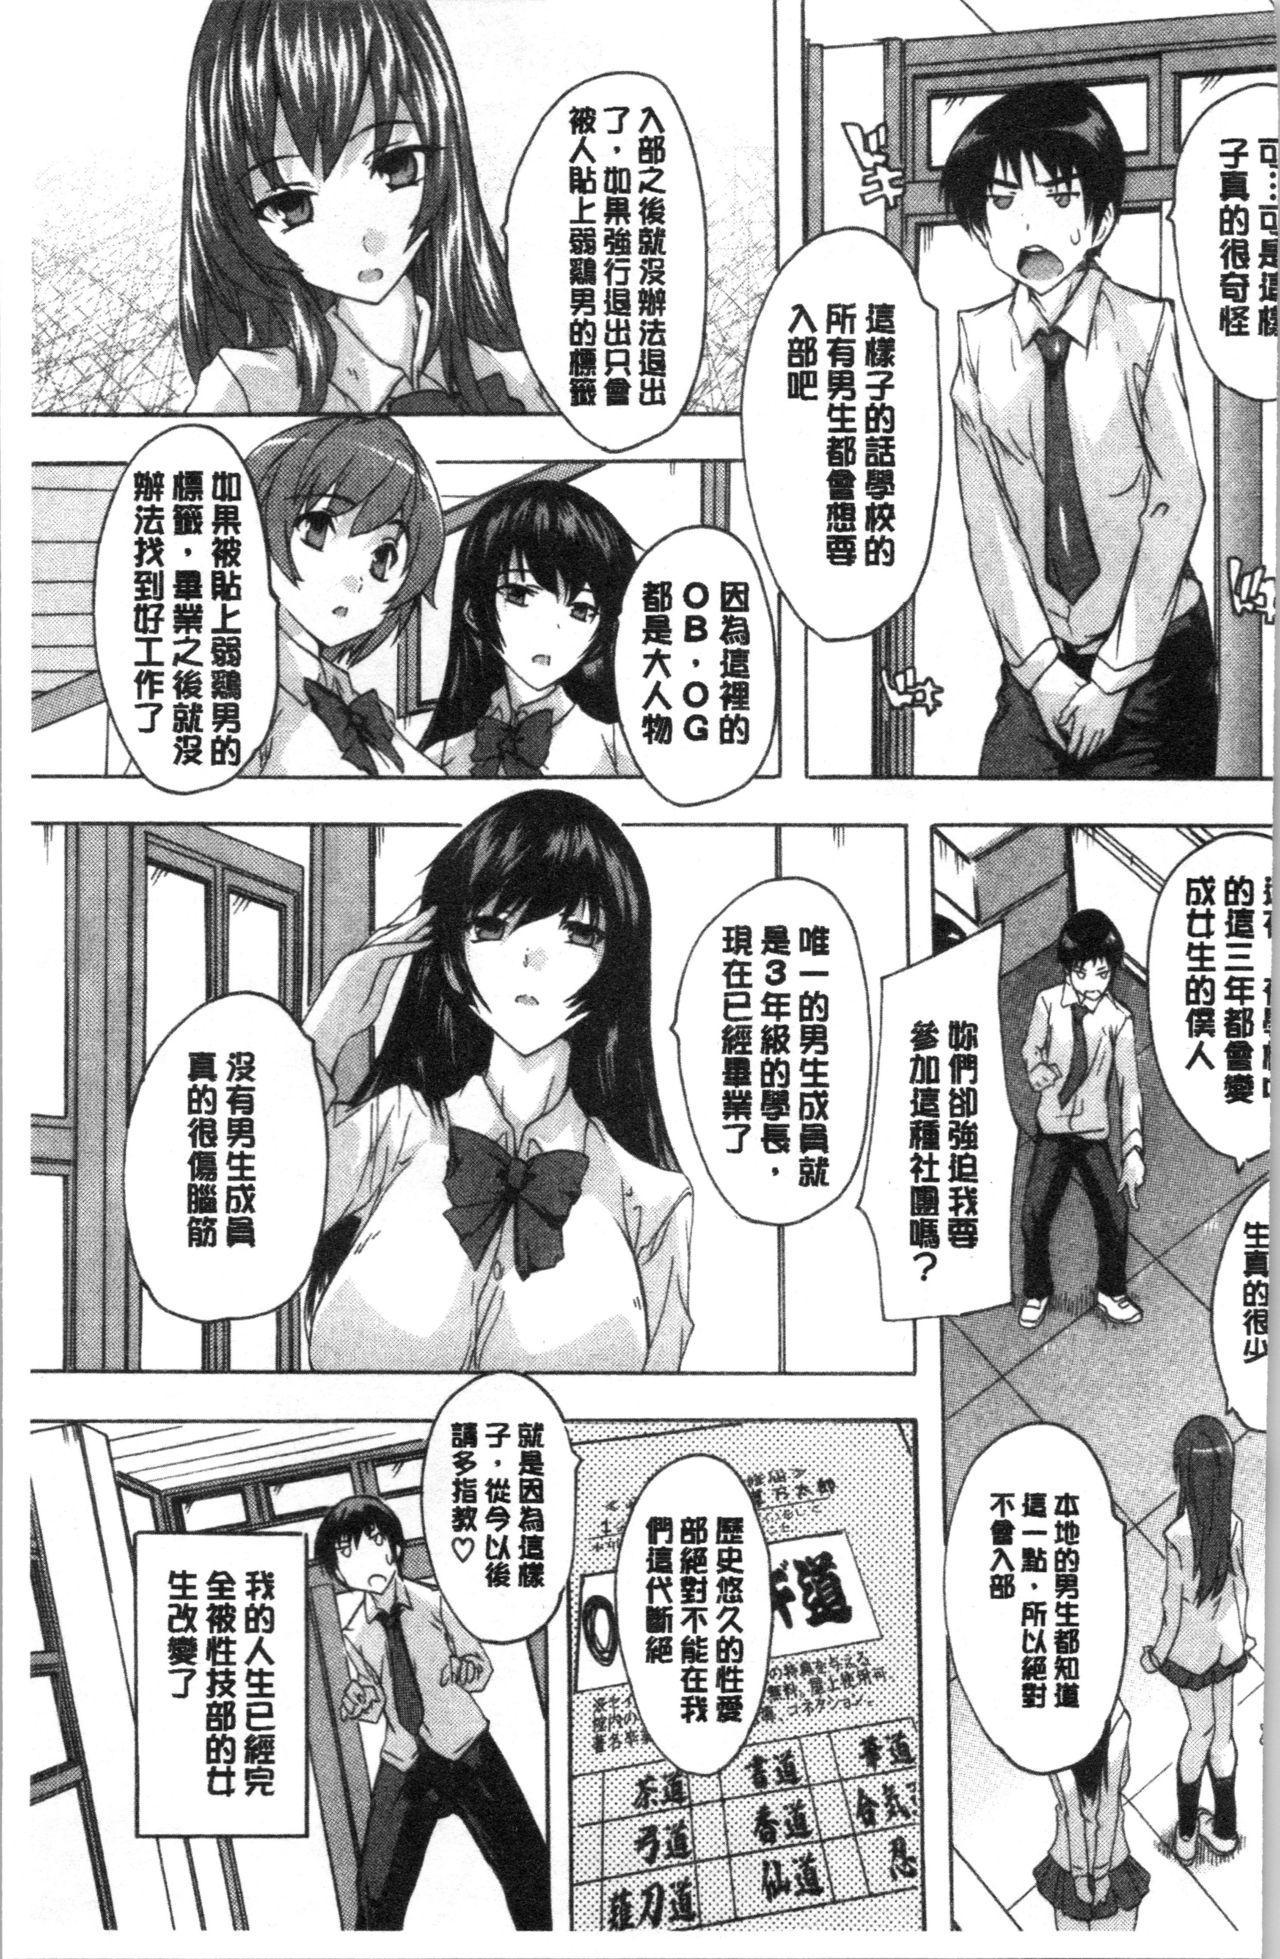 [Natsuka Q-Ya] Hisshuu!! Sex-bu - SEIGI-DO The Ultimate Martial Arts   必修!!性愛淫交部 [Chinese] 11